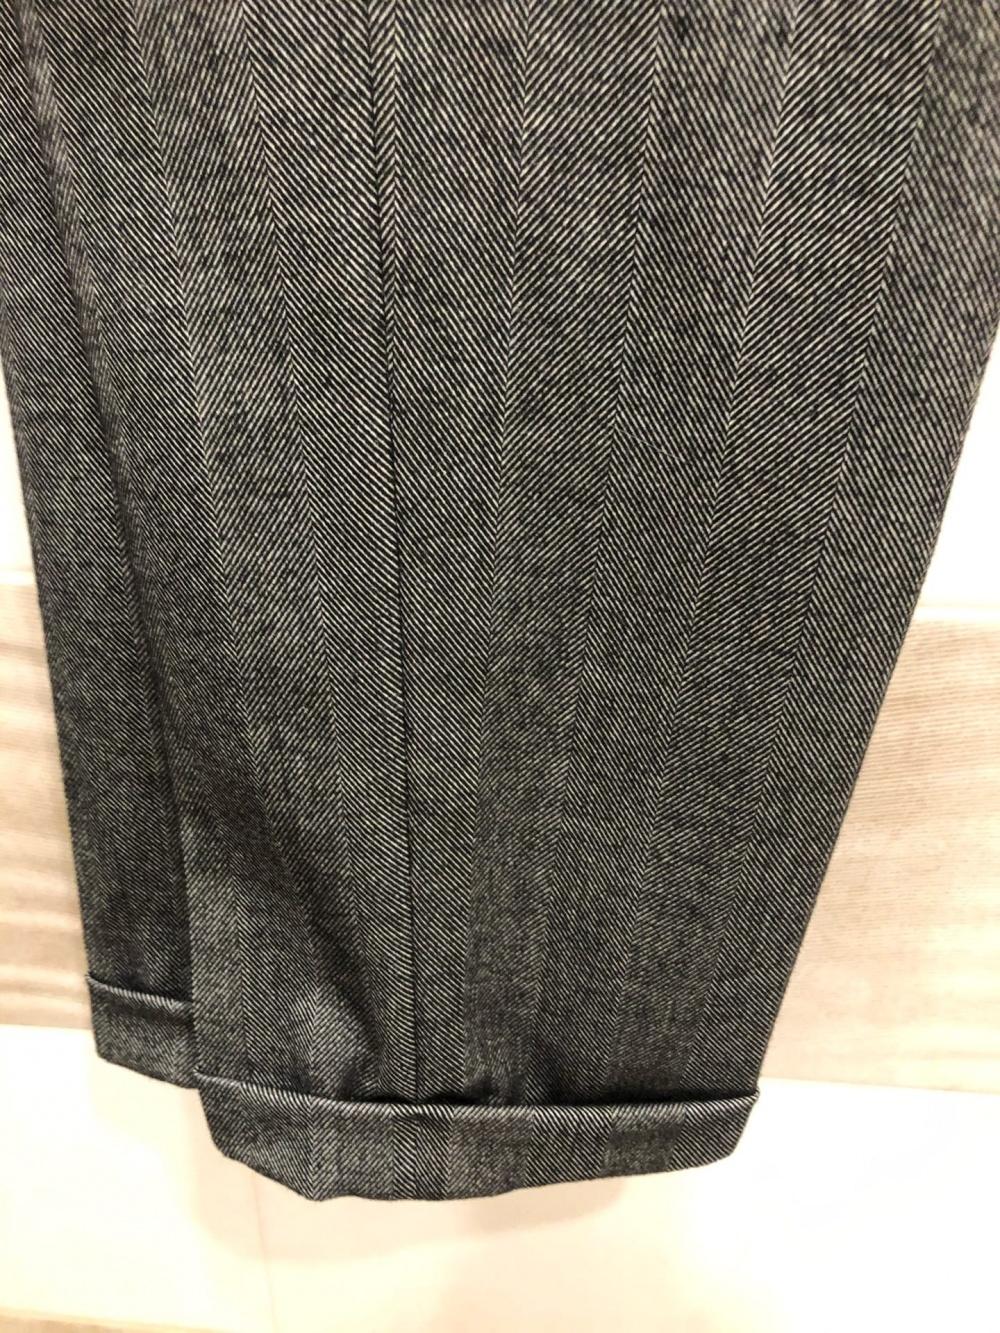 Шерстяные брюки  Marc O'Polo.Размер L-XL.